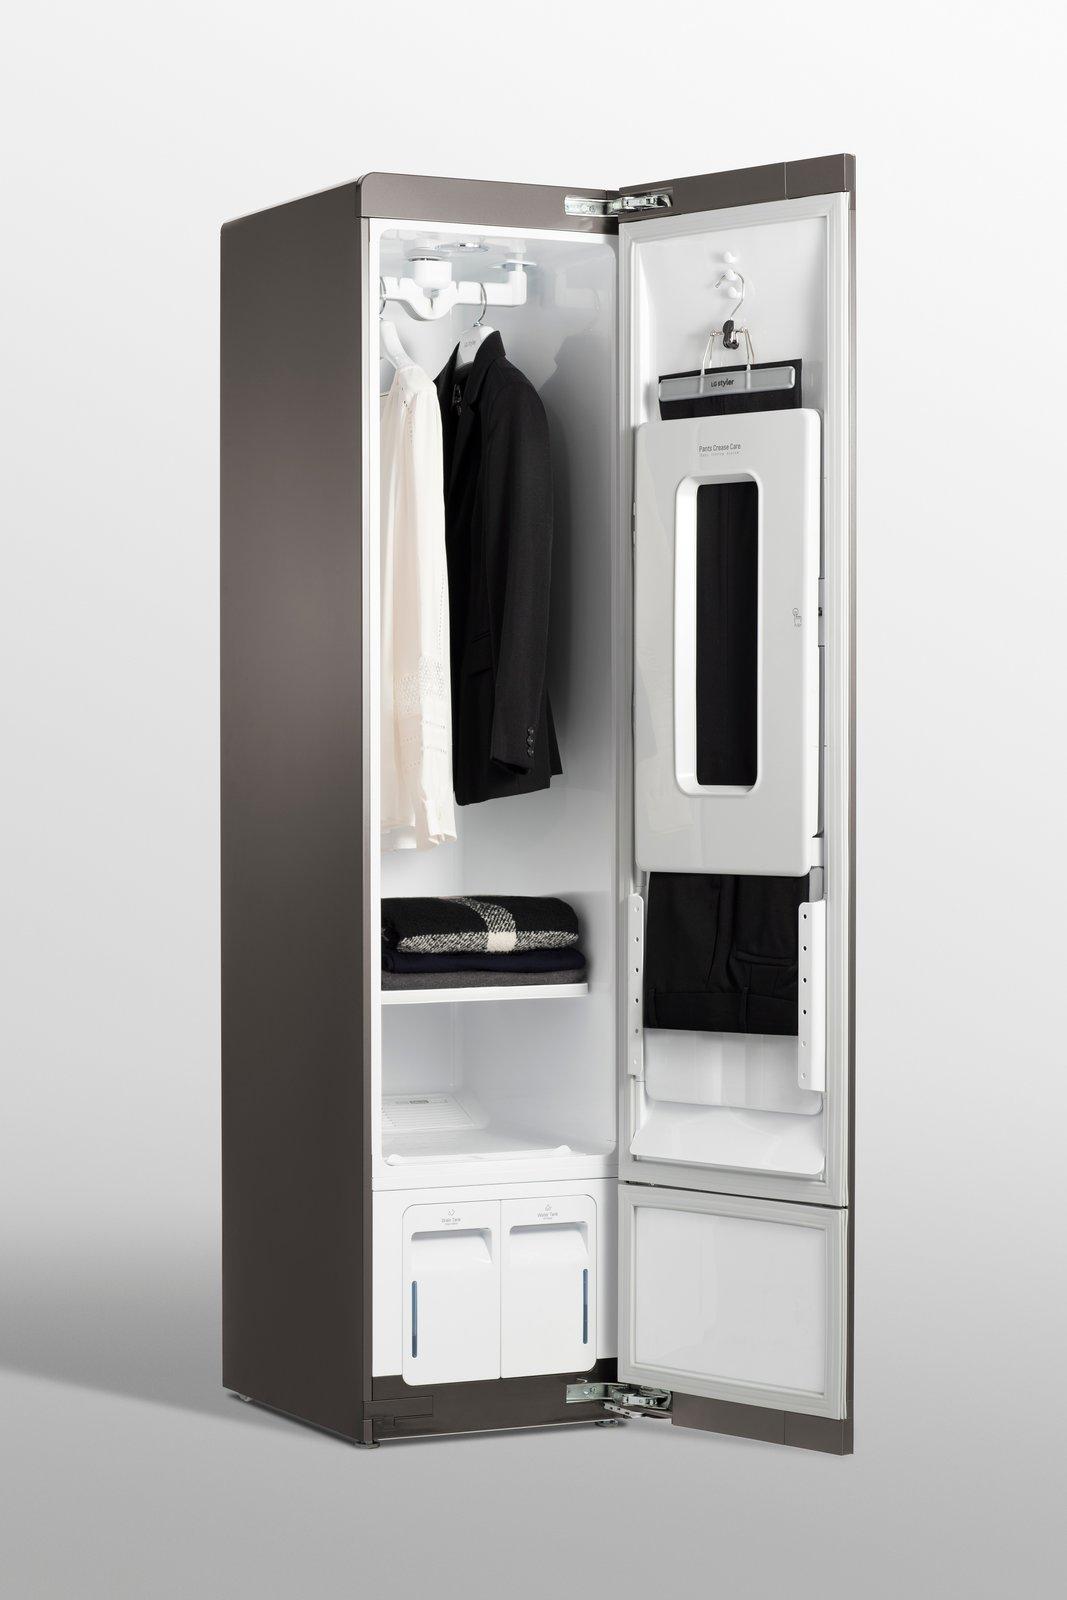 LG Styler Signature smart home appliance laundry